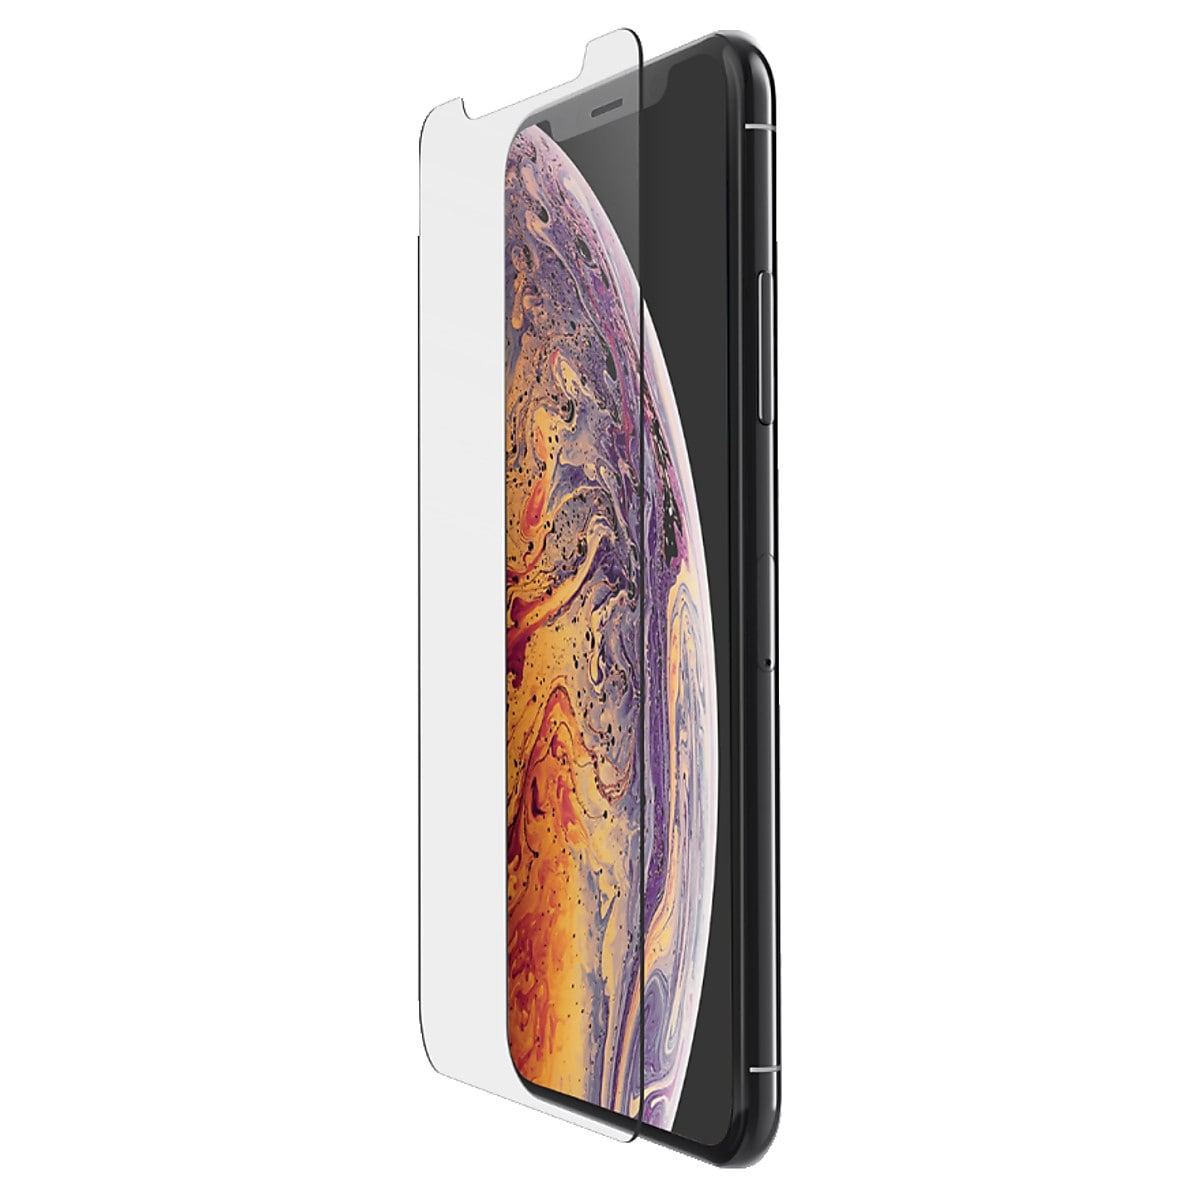 Skärmskydd för iPhone XS Max Belkin ScreenForce InivisiGlass Ultra